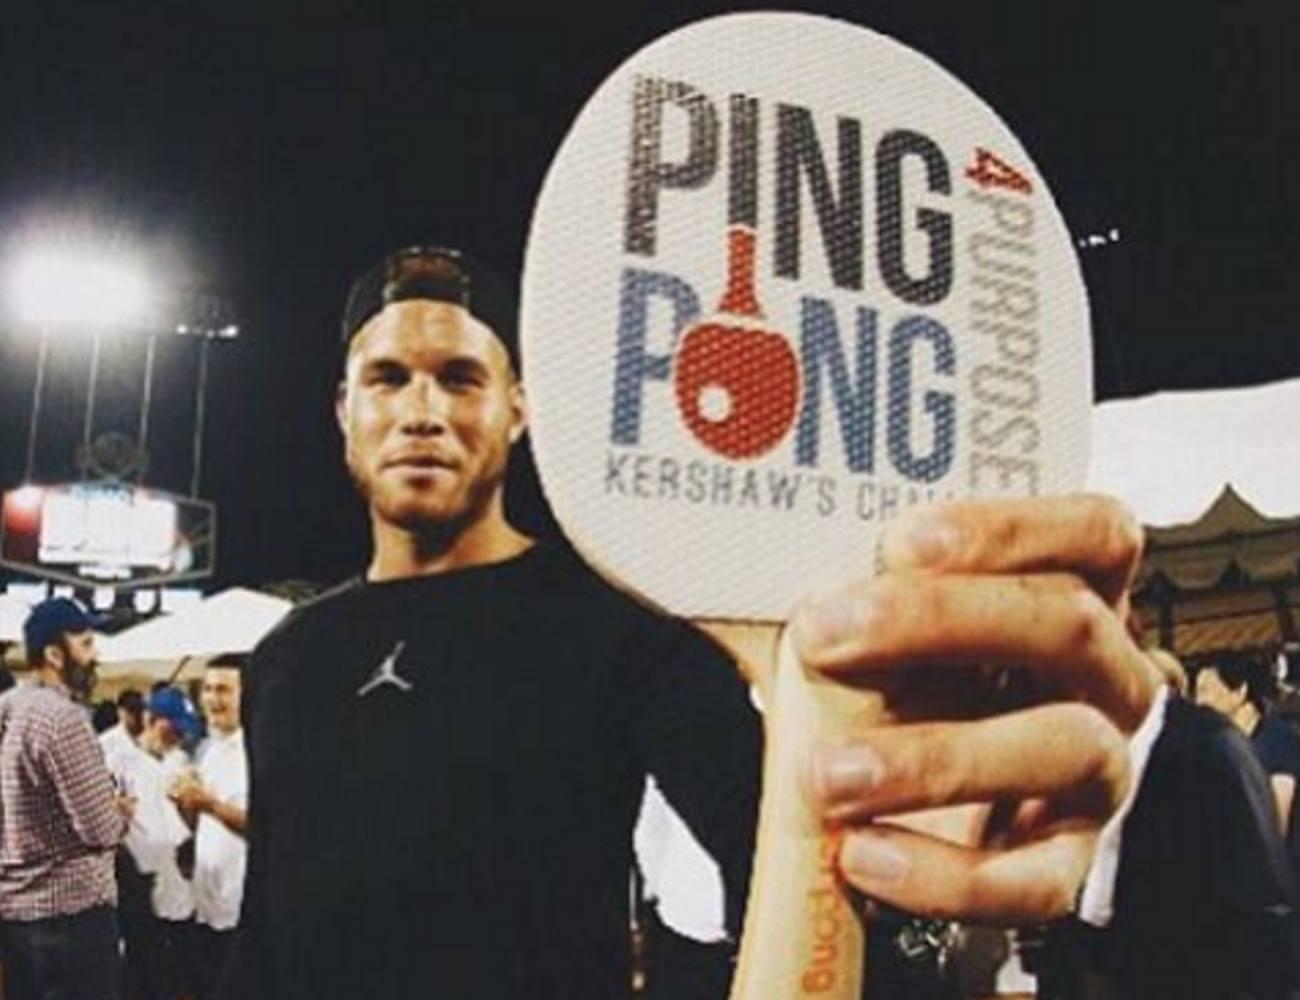 Uberpong Custom Ping Pong Paddle Set